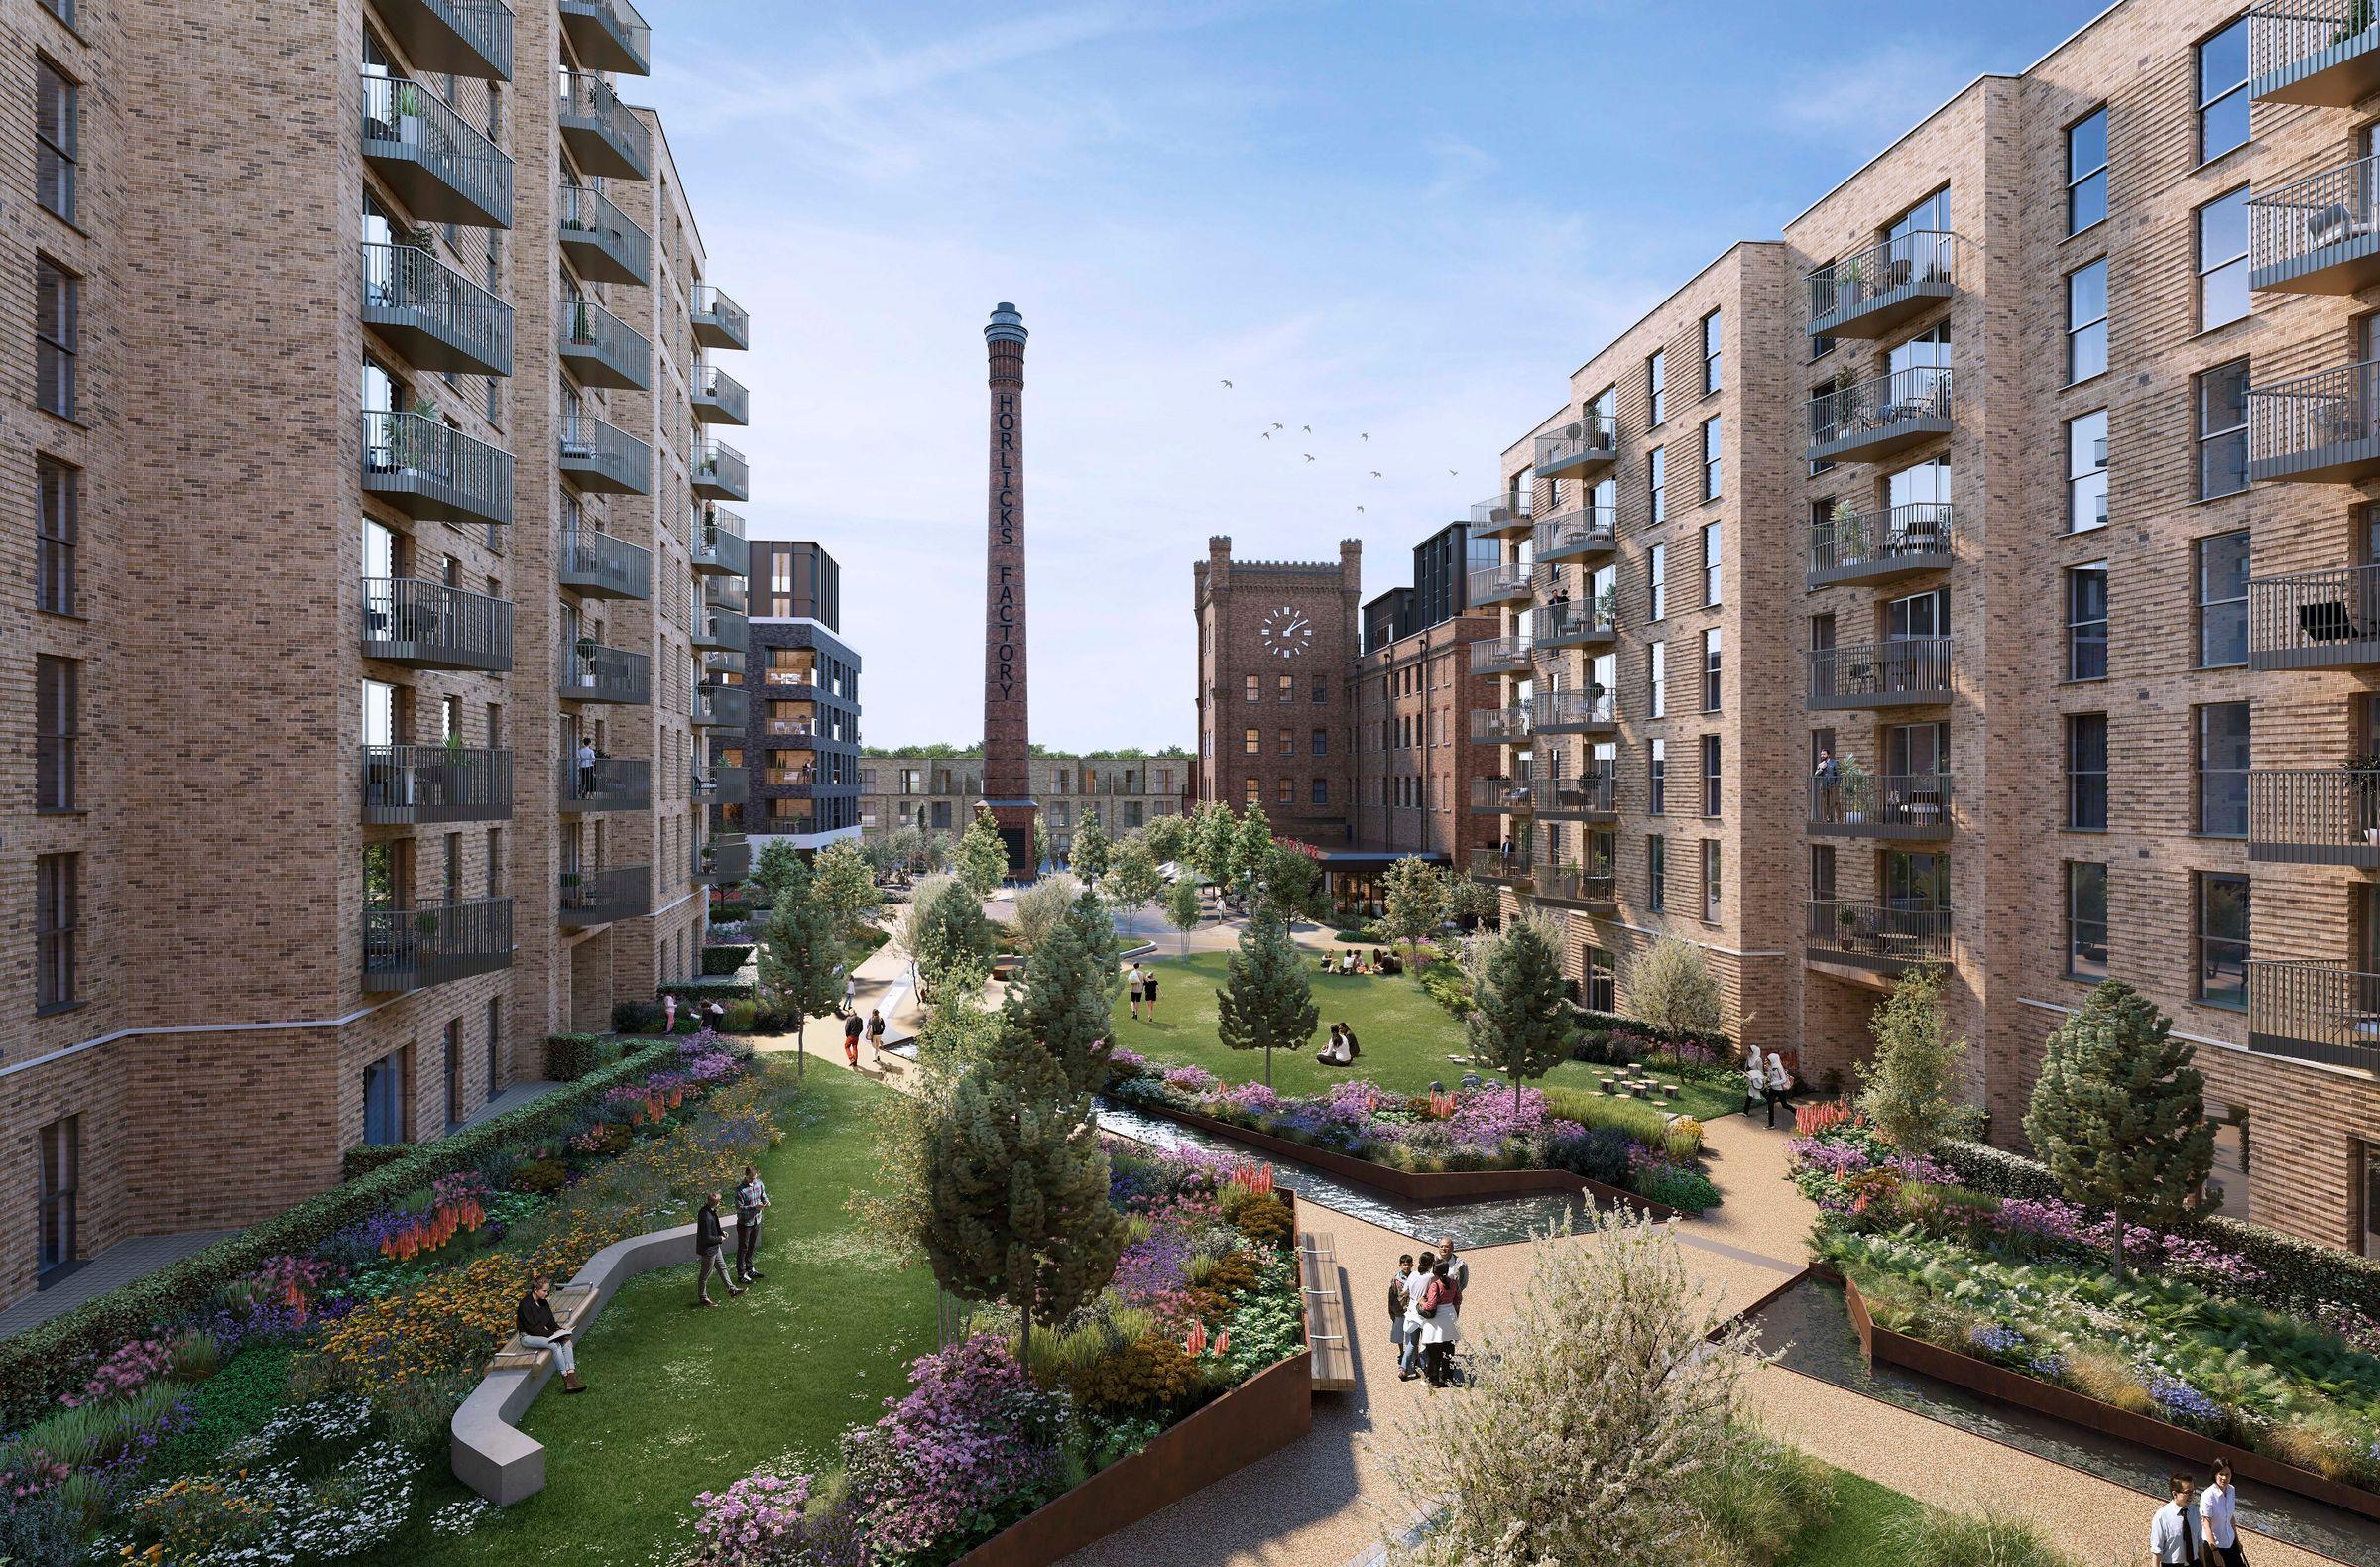 Horlicks Quarter development image 1 of 1